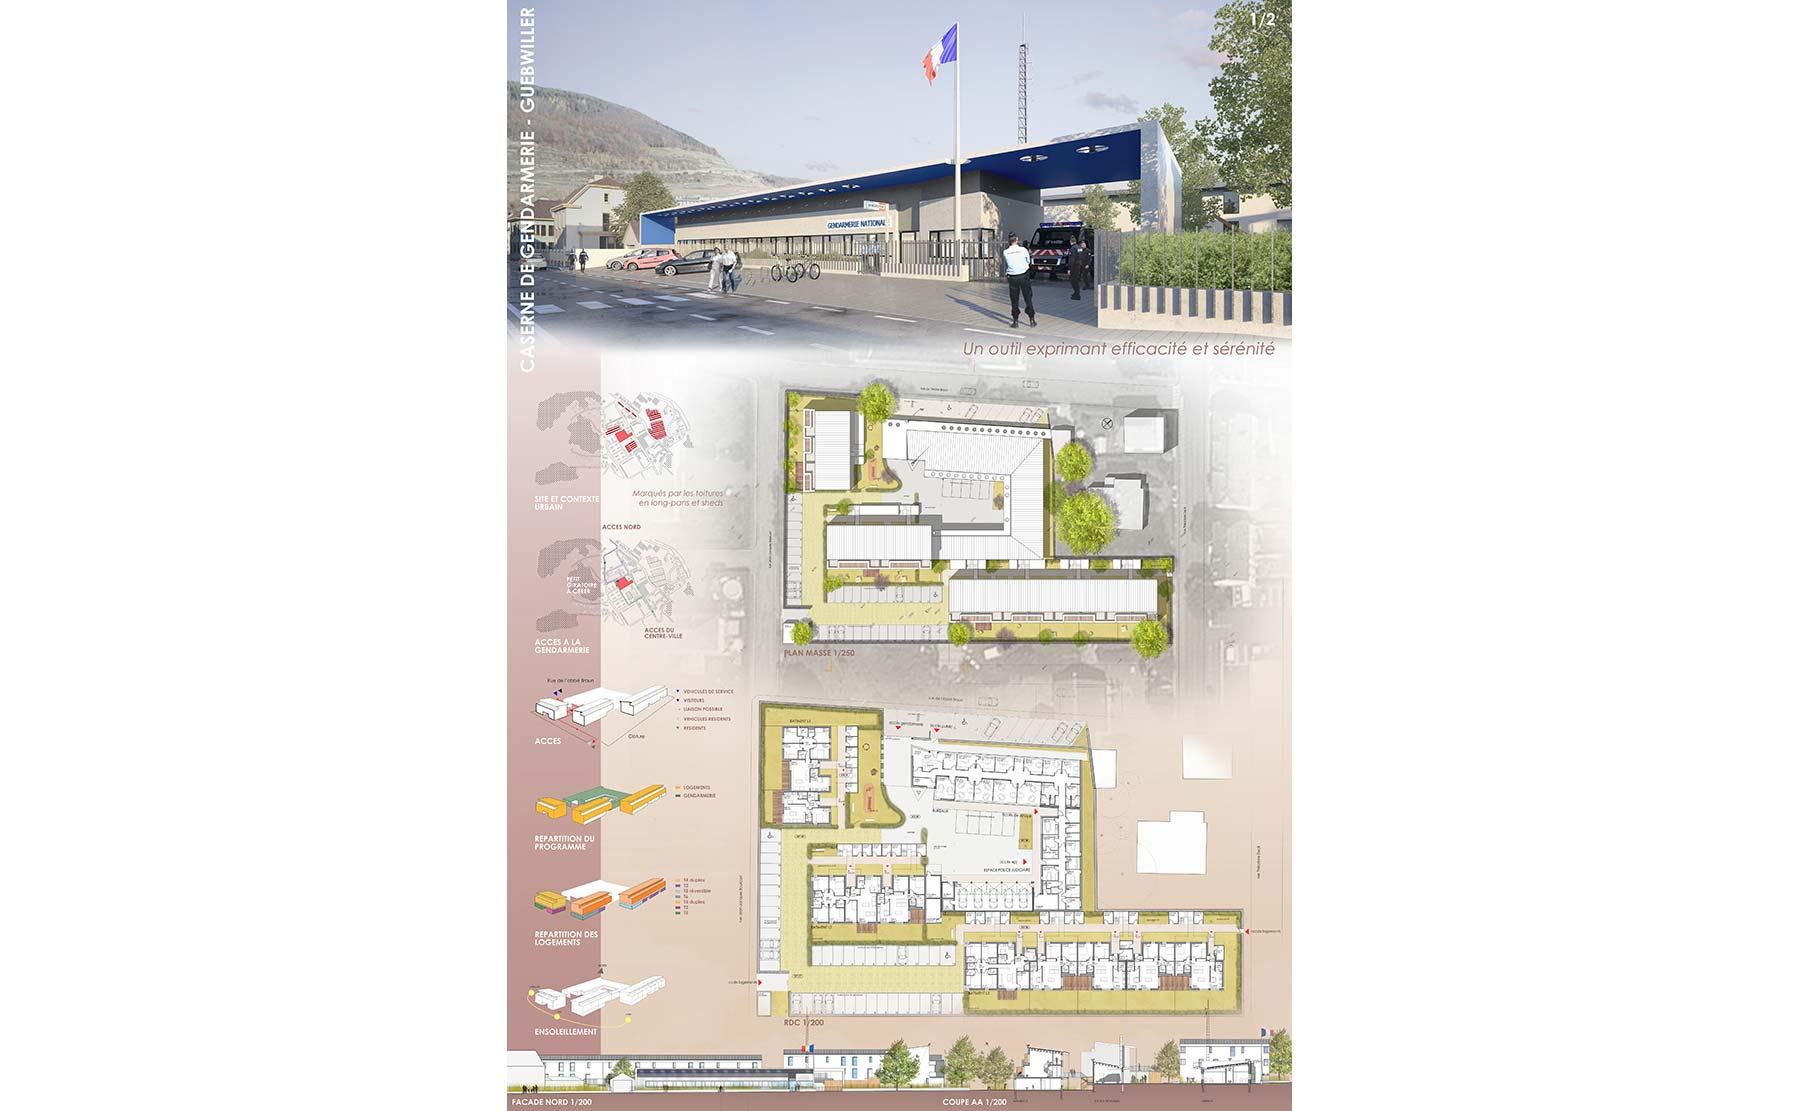 Mongiello & plisson caserne de gendarmerie guebwiller planches